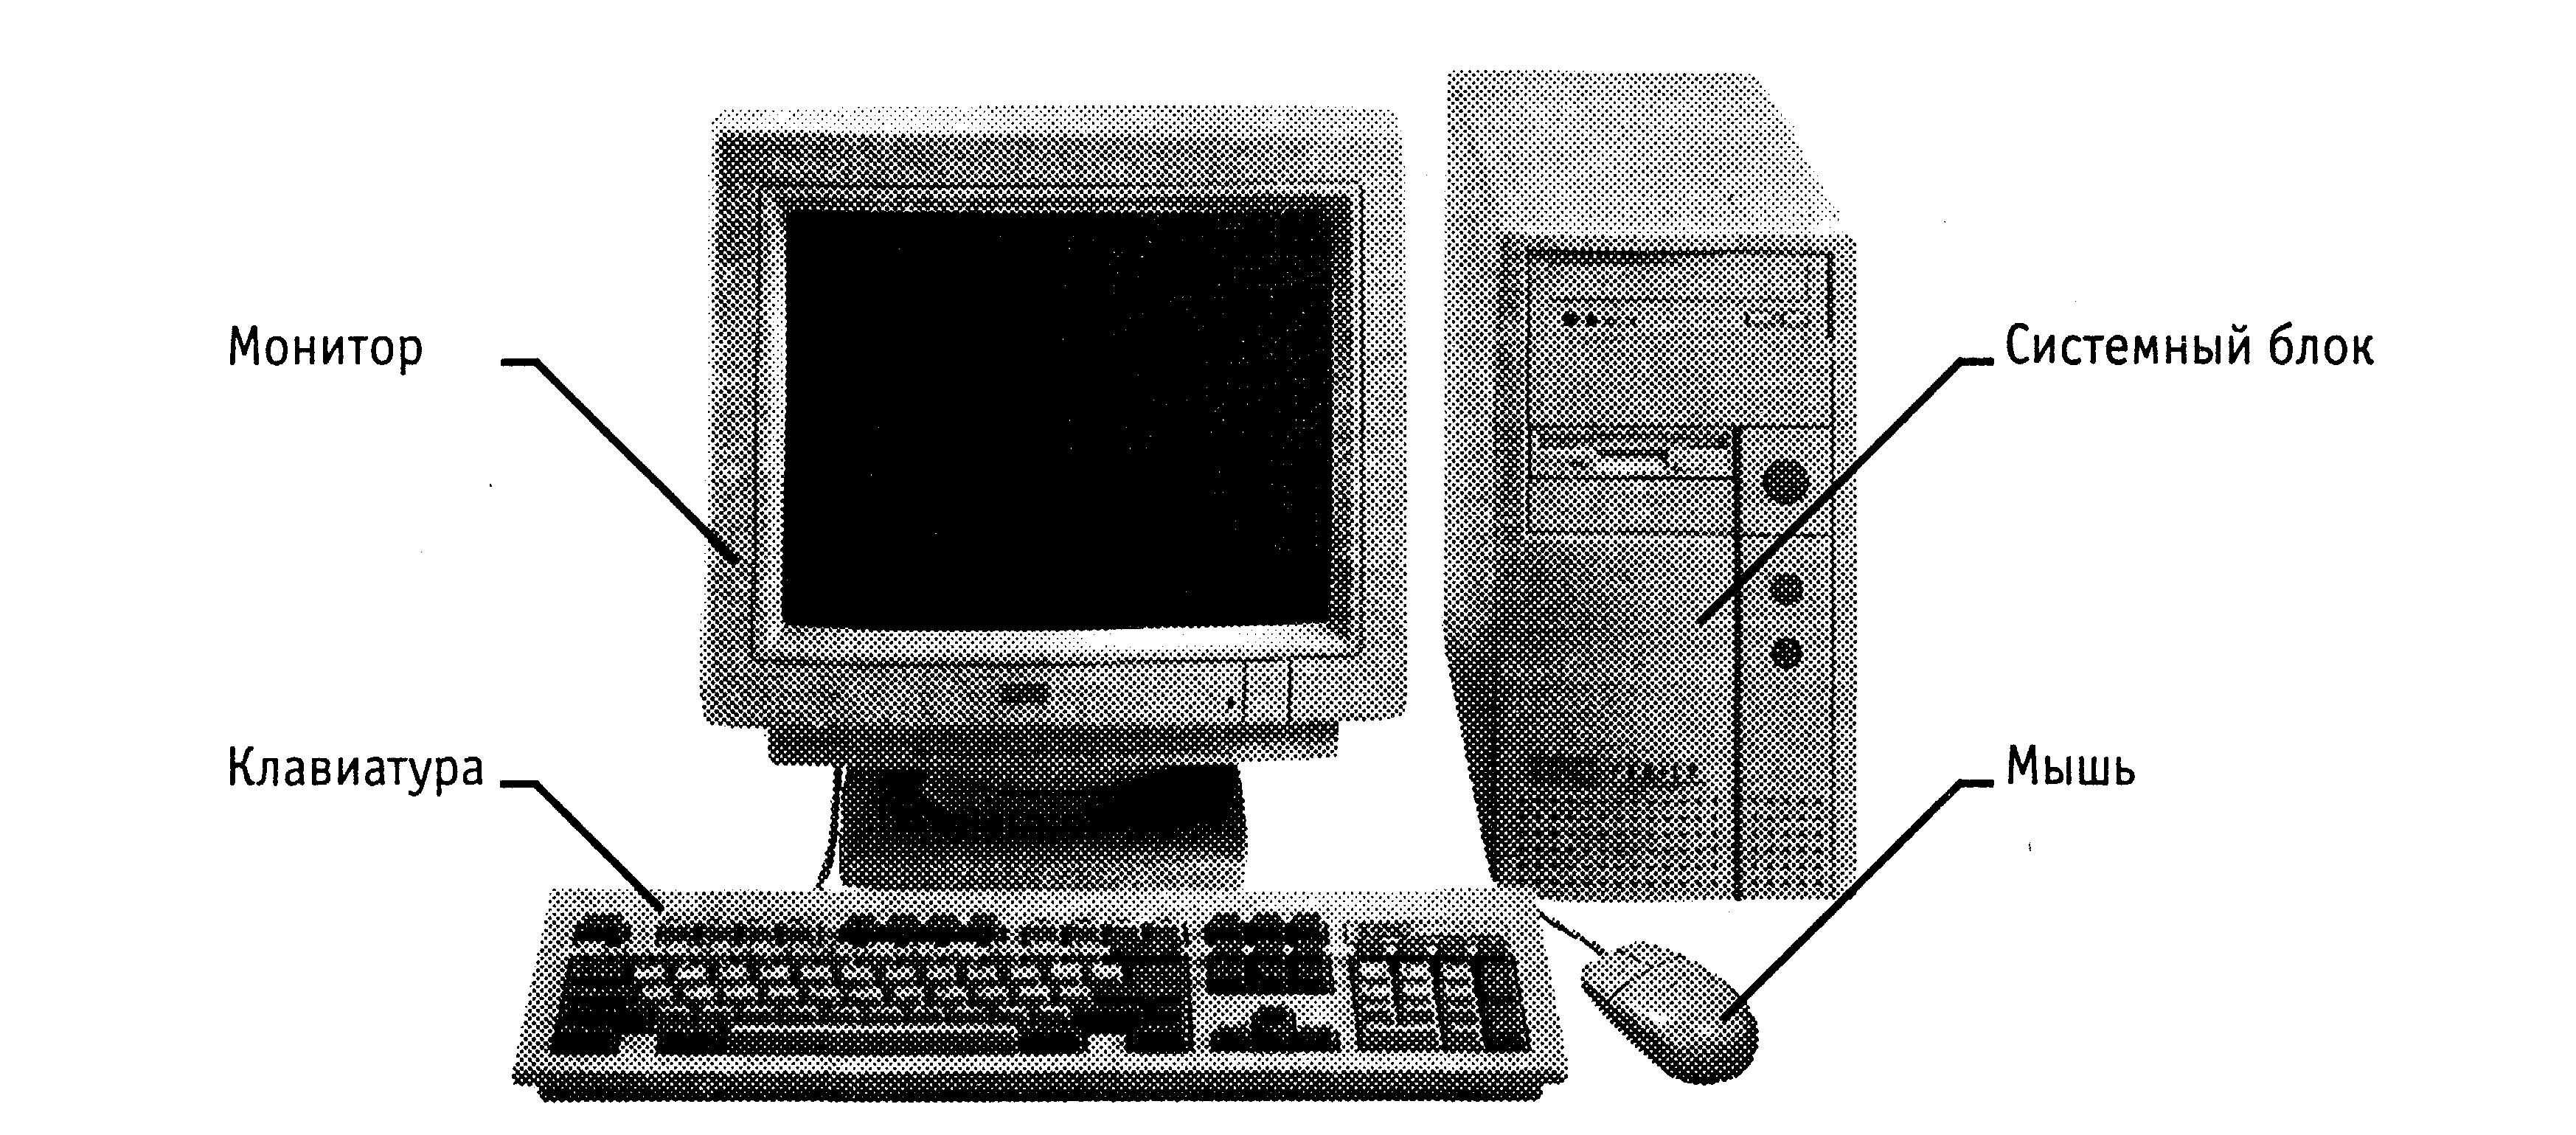 Базовая аппаратная конфигурация пк реферат 72